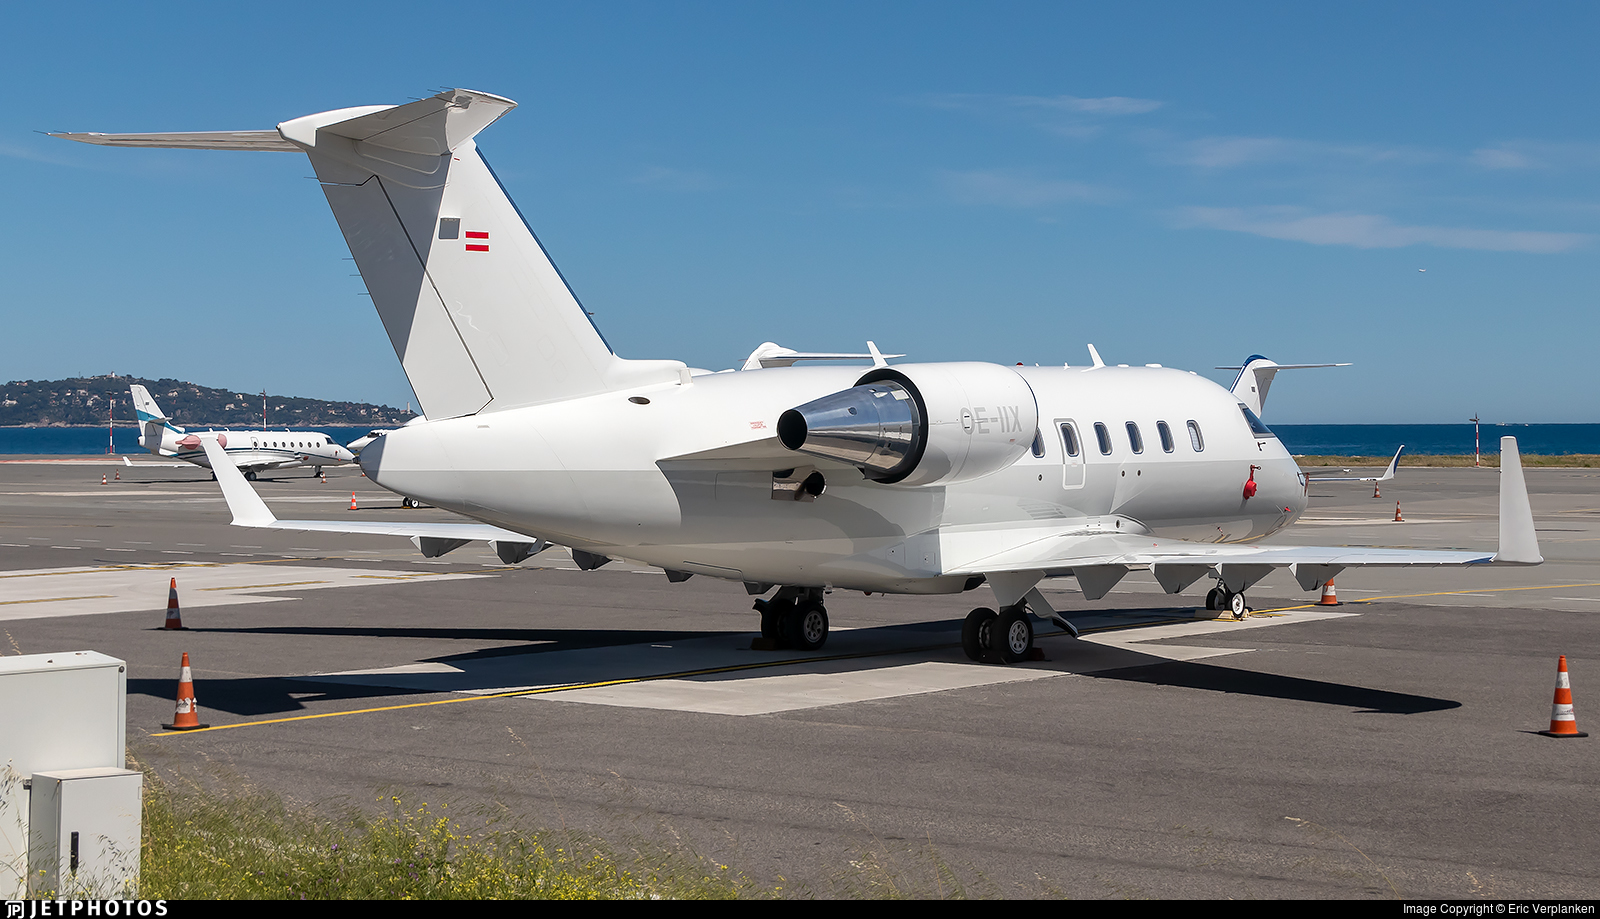 OE-IIX - Bombardier CL-600-2B16 Challenger 605 - Sparfell Luftfahrt